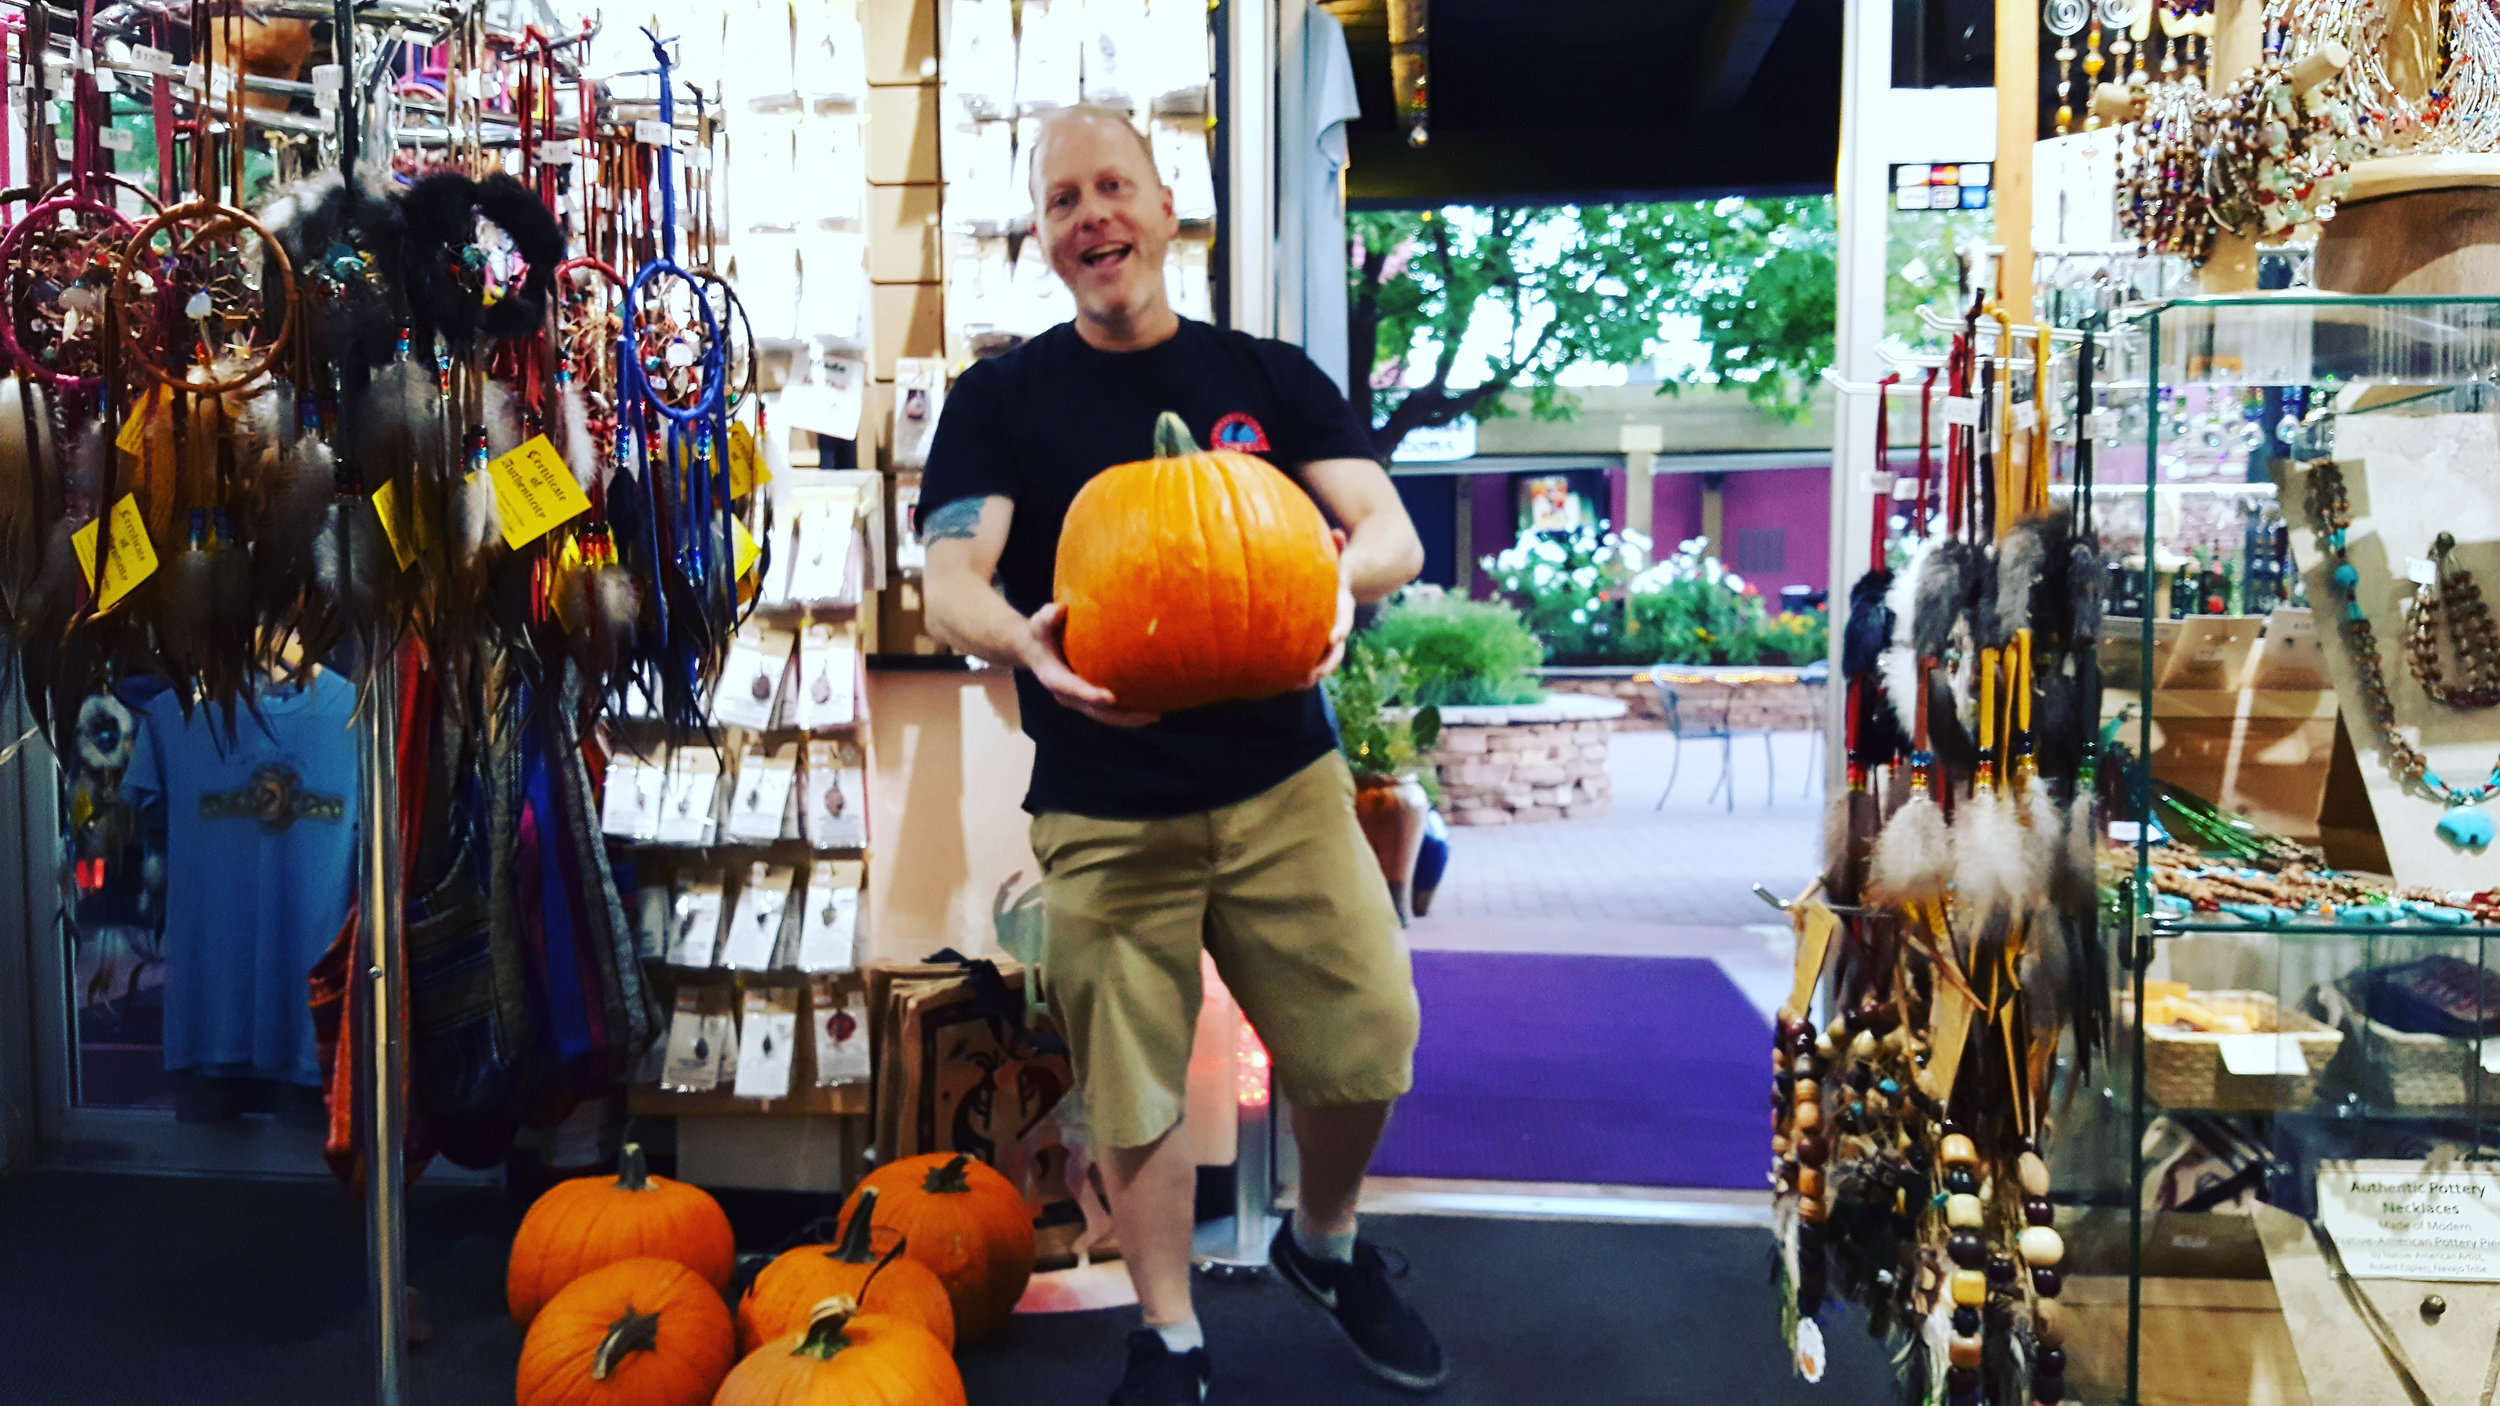 Pumpkins_Sedona_Oct_10_17_B.jpg